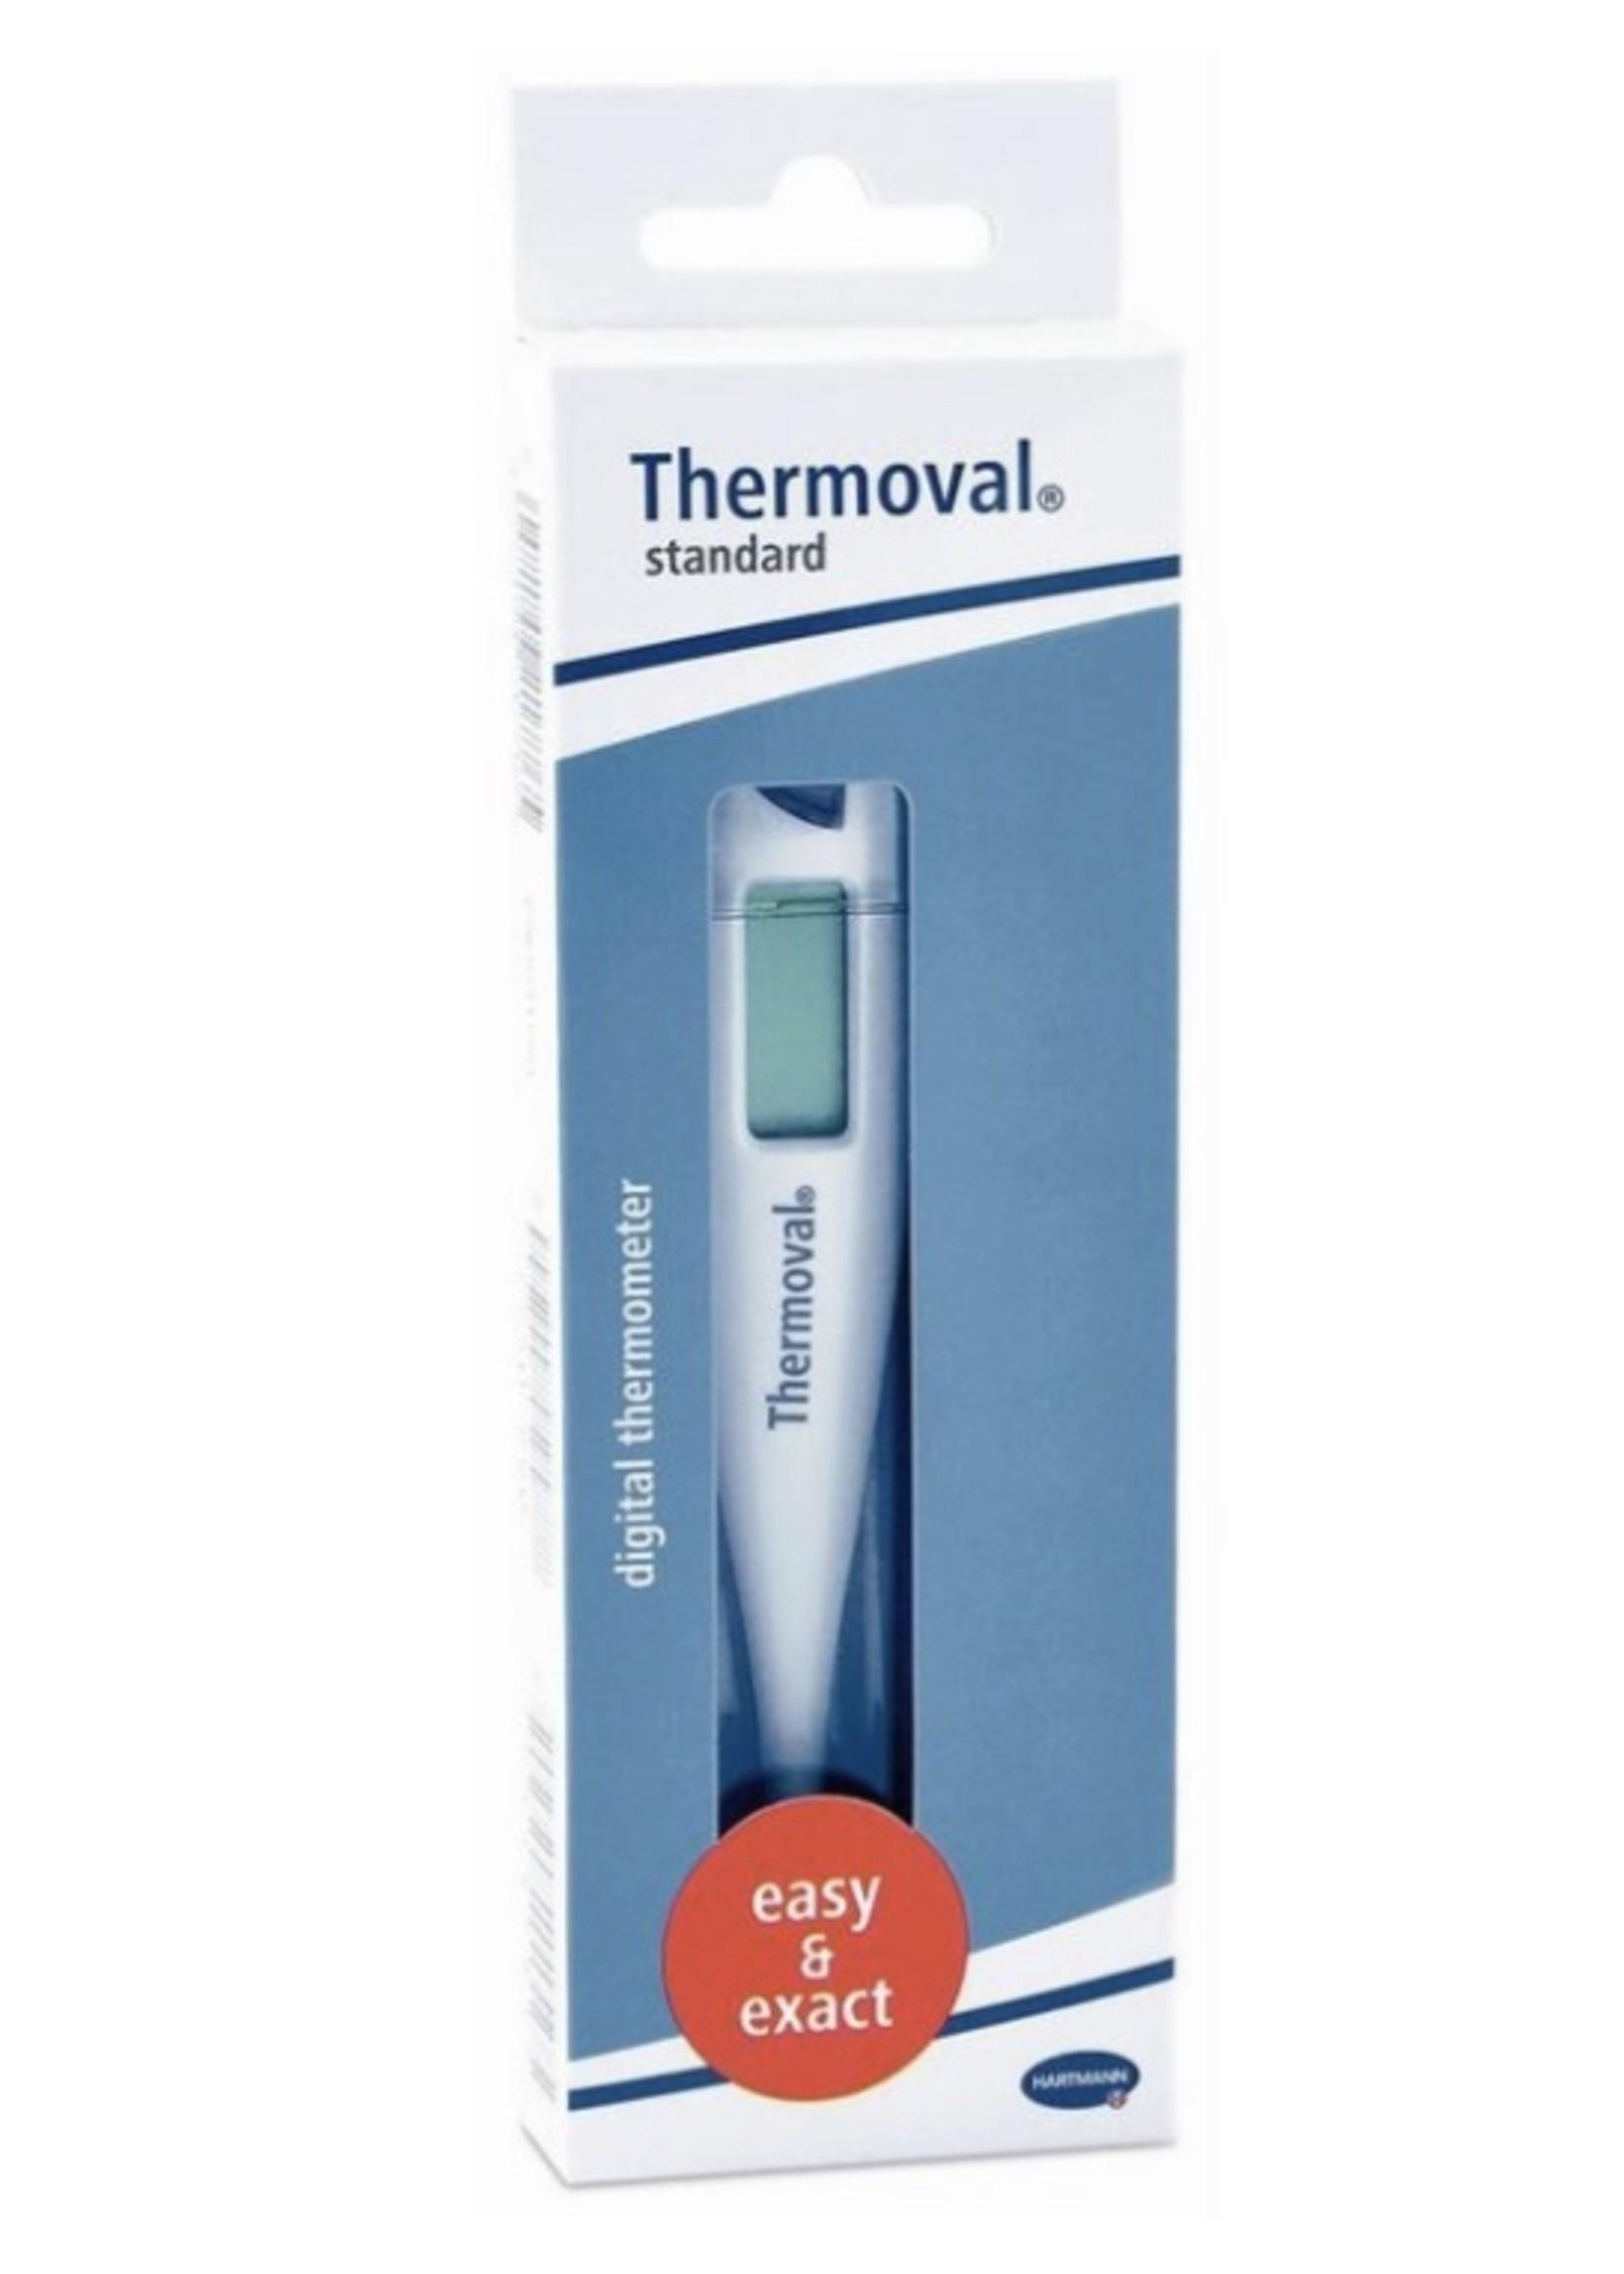 Hartmann Thermoval® standard digitale koortsthermometer